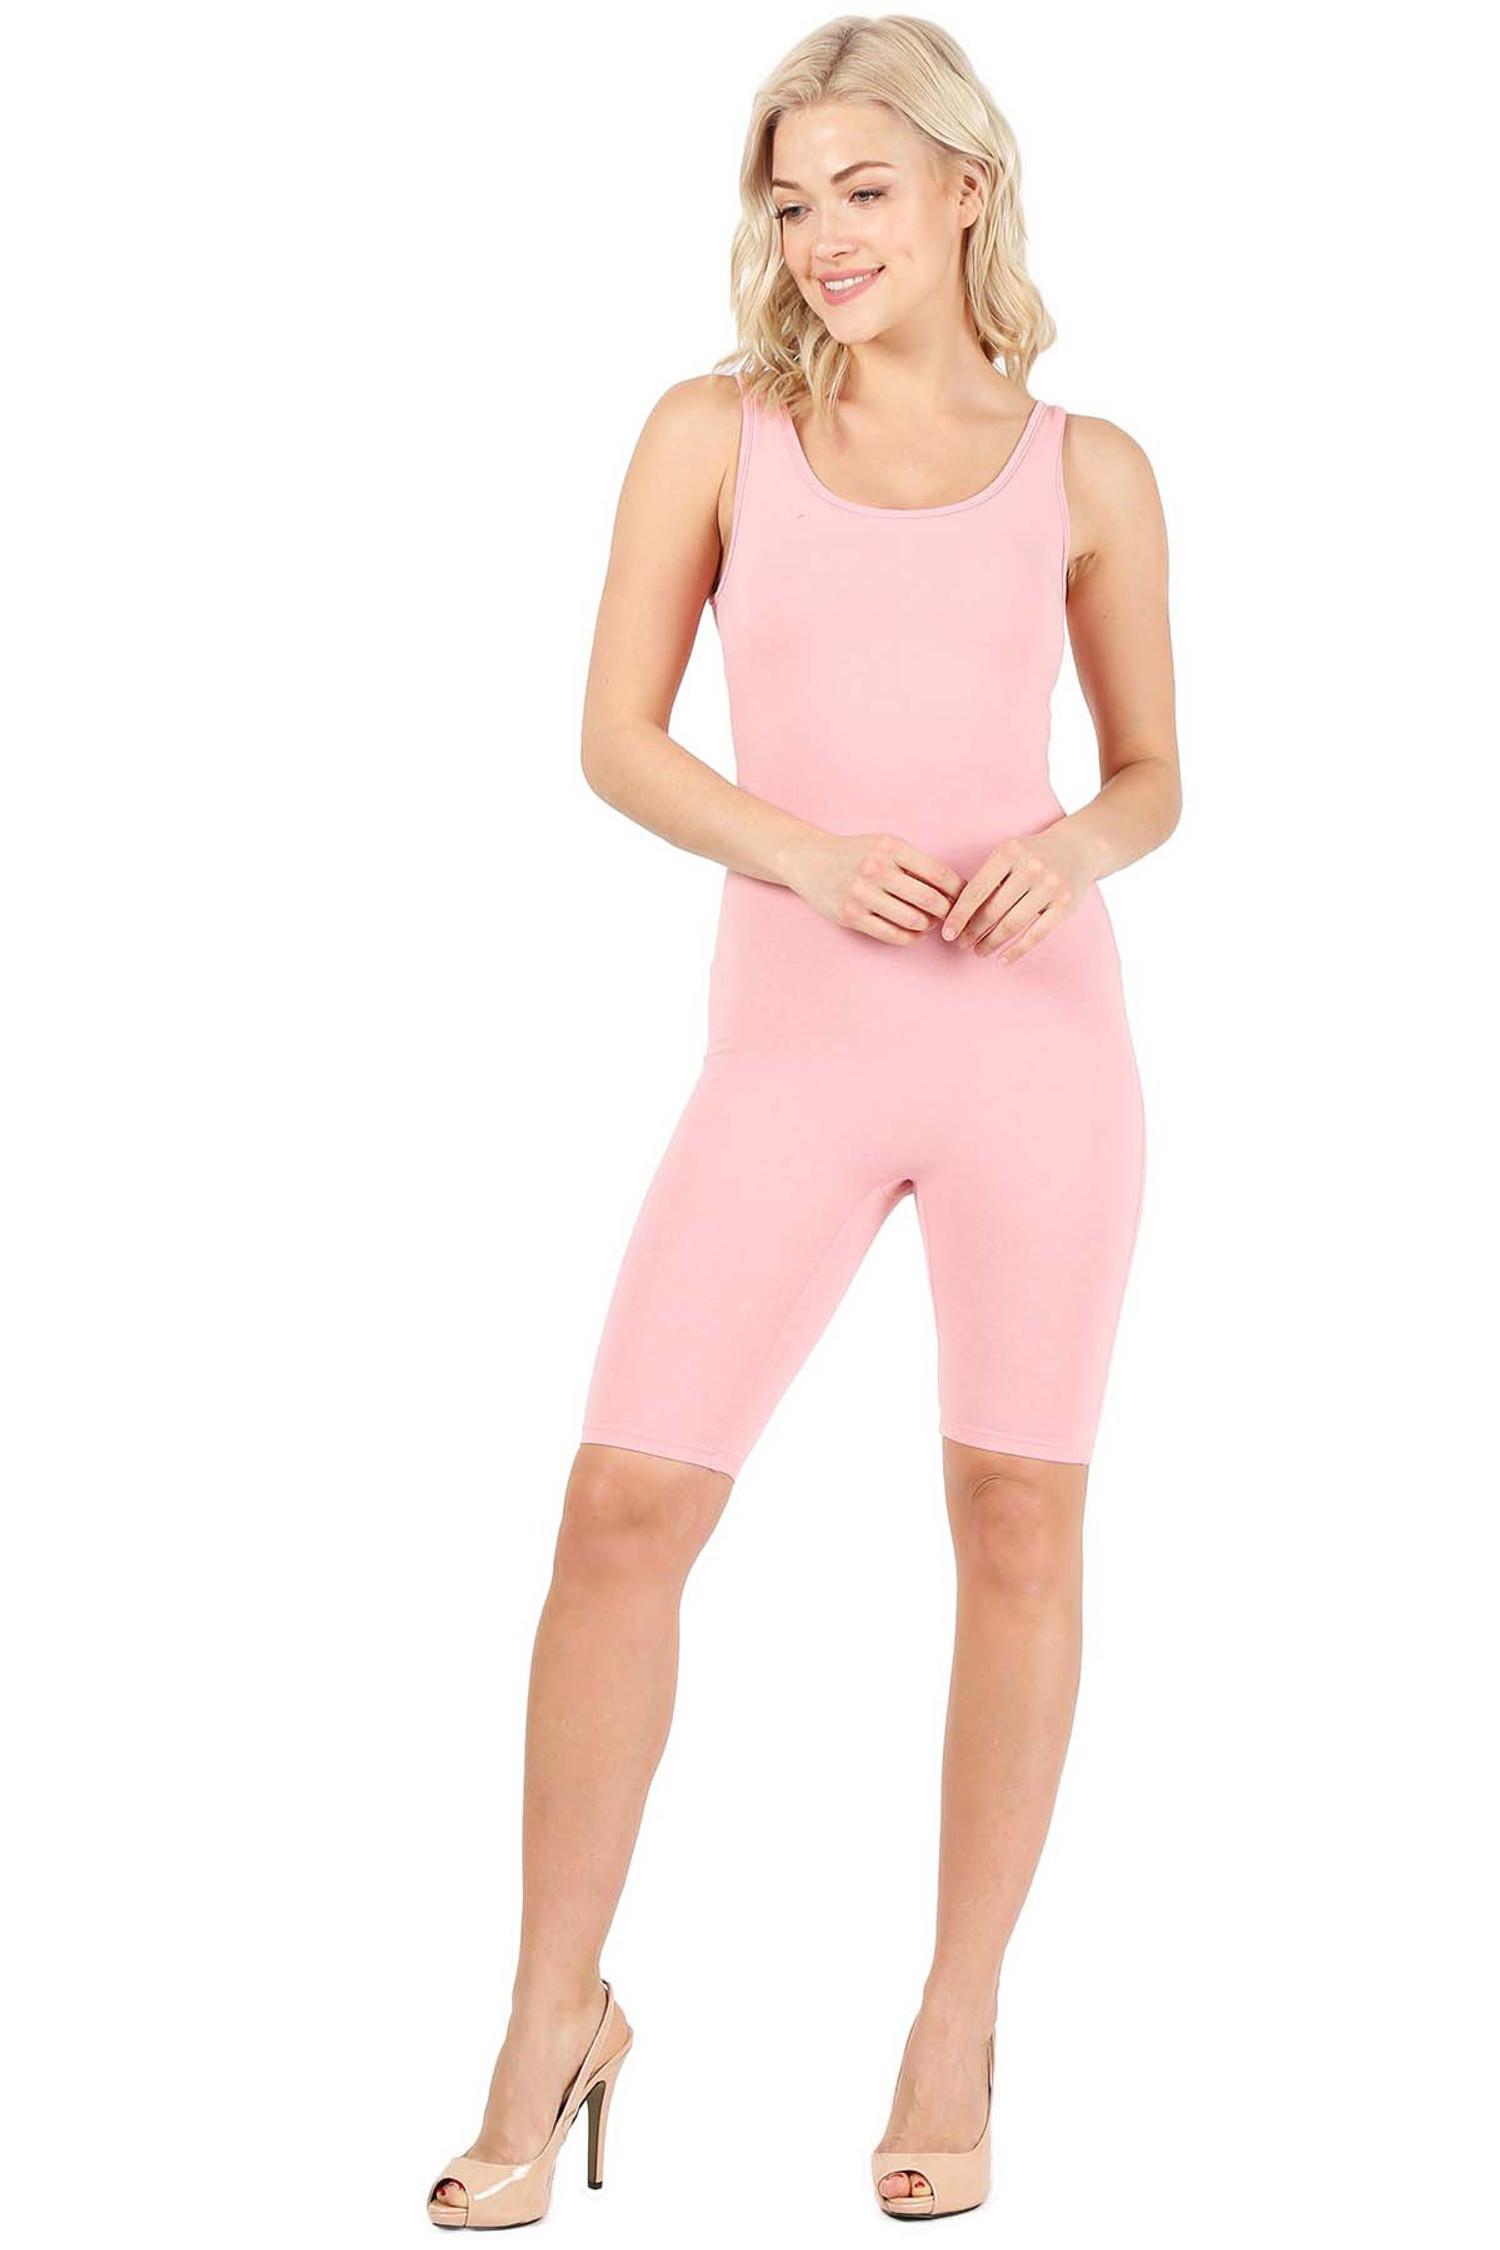 Pink USA Basic Cotton Thigh High Jumpsuit